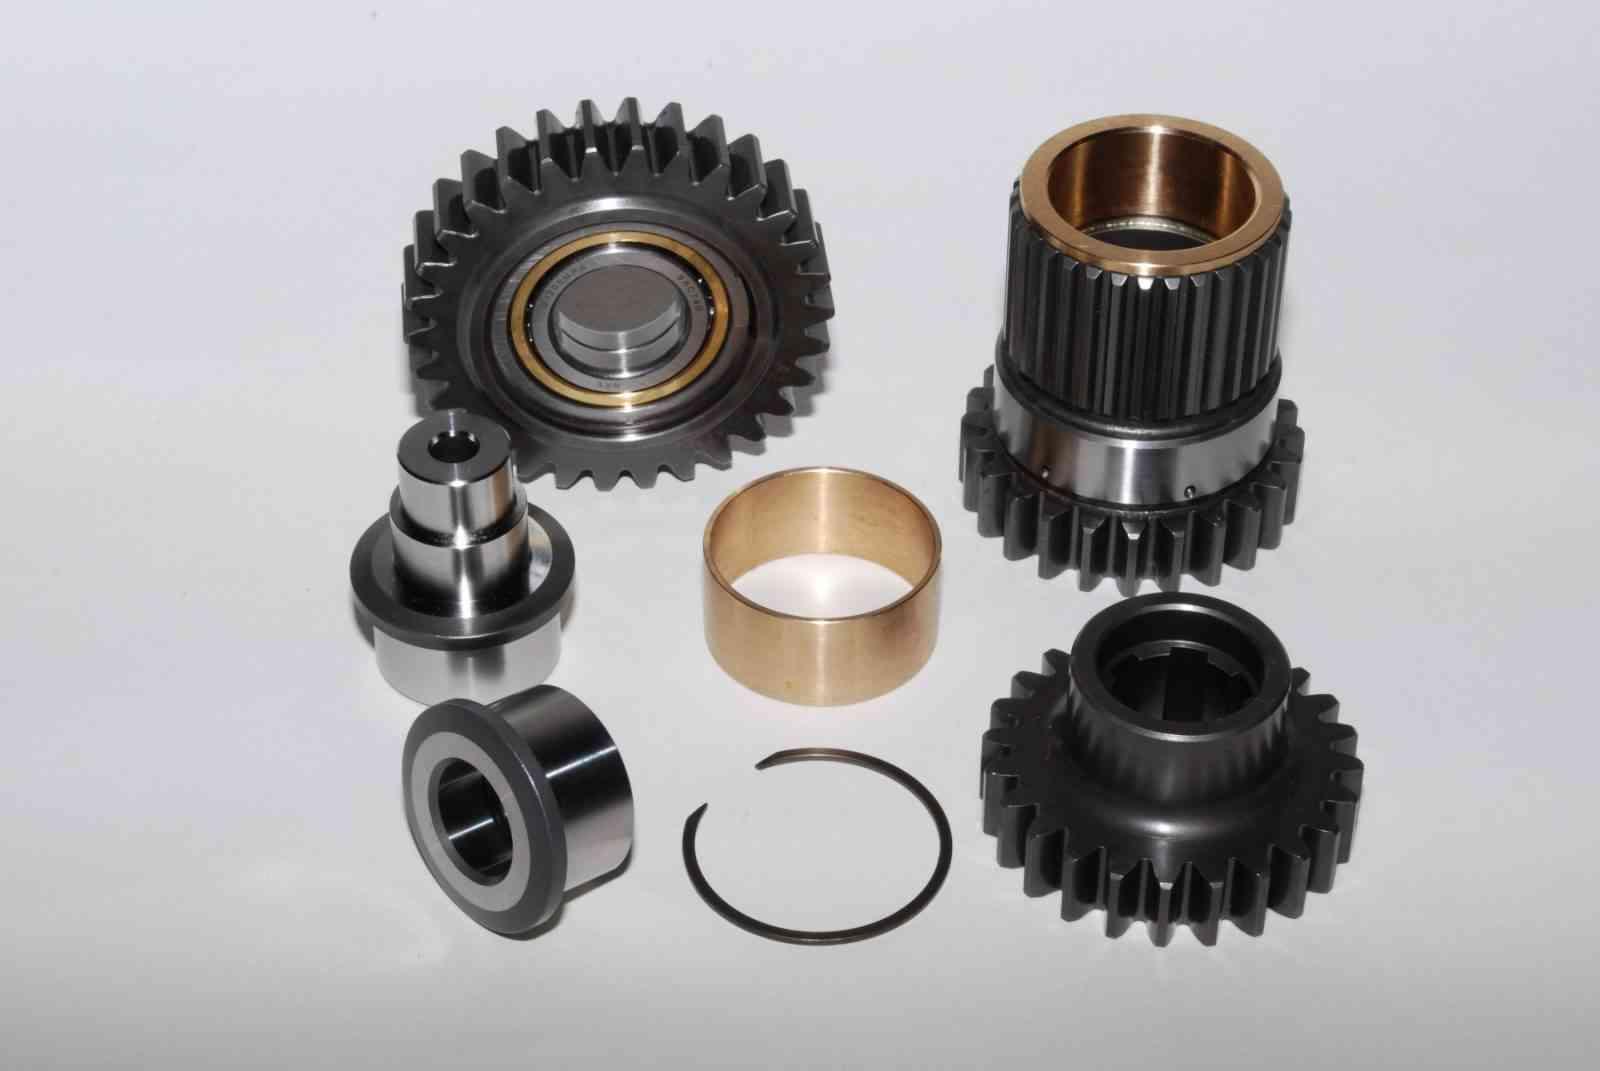 straight cut gears- explained